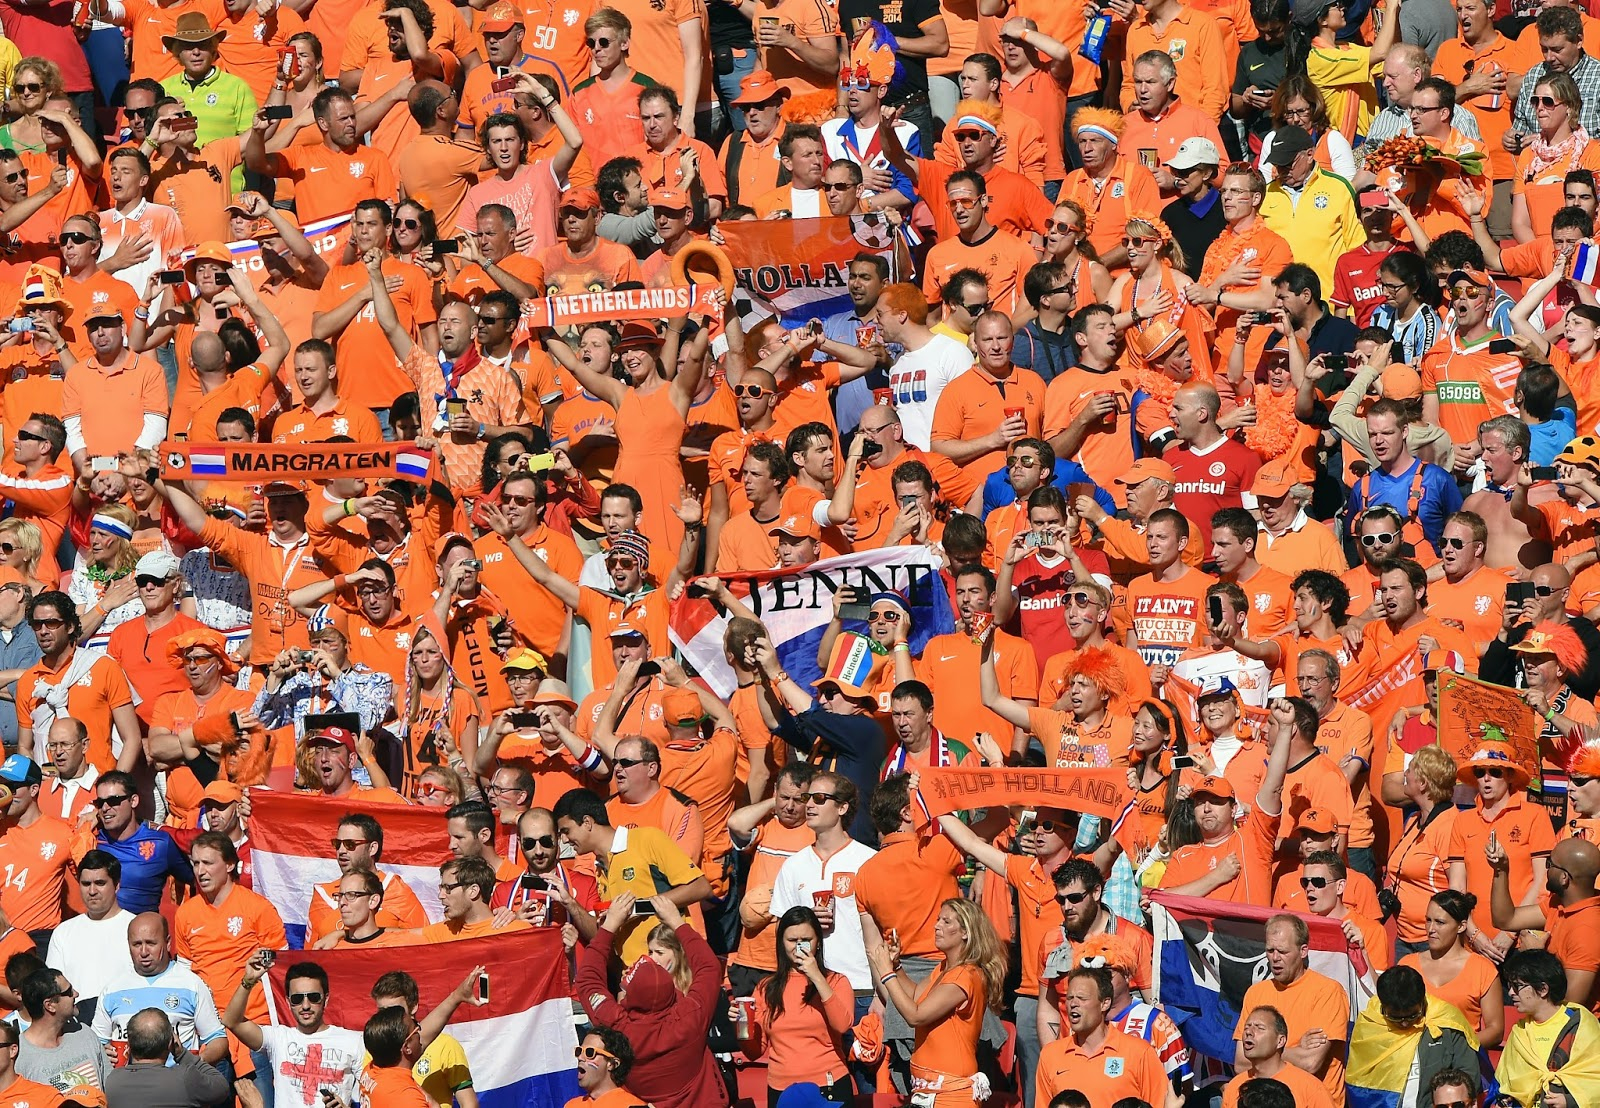 Ange Postecoglou, Arjen Robben, Australia Match, Australia vs Netherlands, FIFA World Cup, FIFA World Cup 2014, Group B, Louis van Gaal, Memphis Depay, Netherlands Match, Robin van Persie, Tim Cahill,